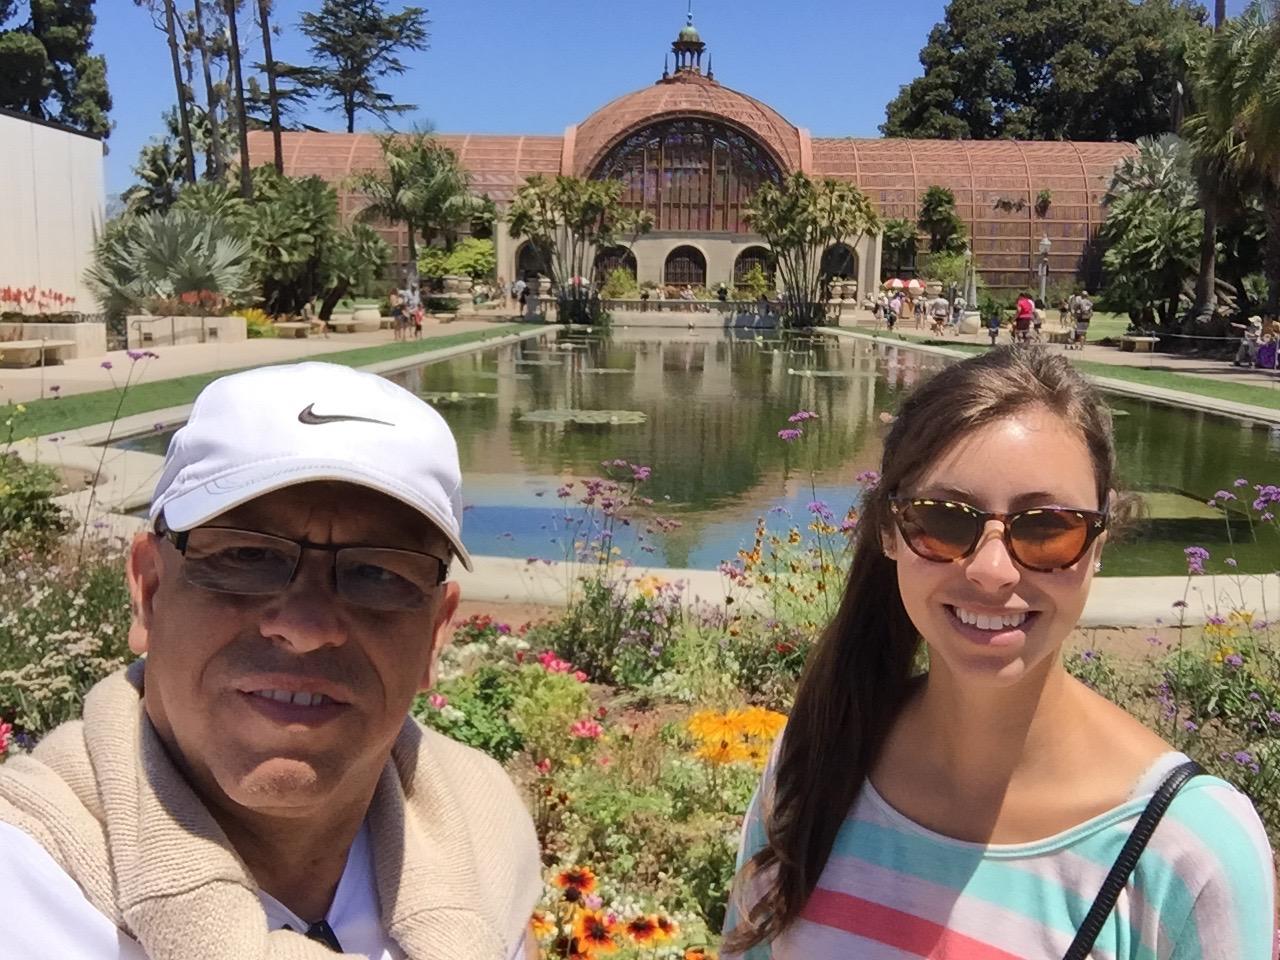 MC and Tiffany at Balboa Park